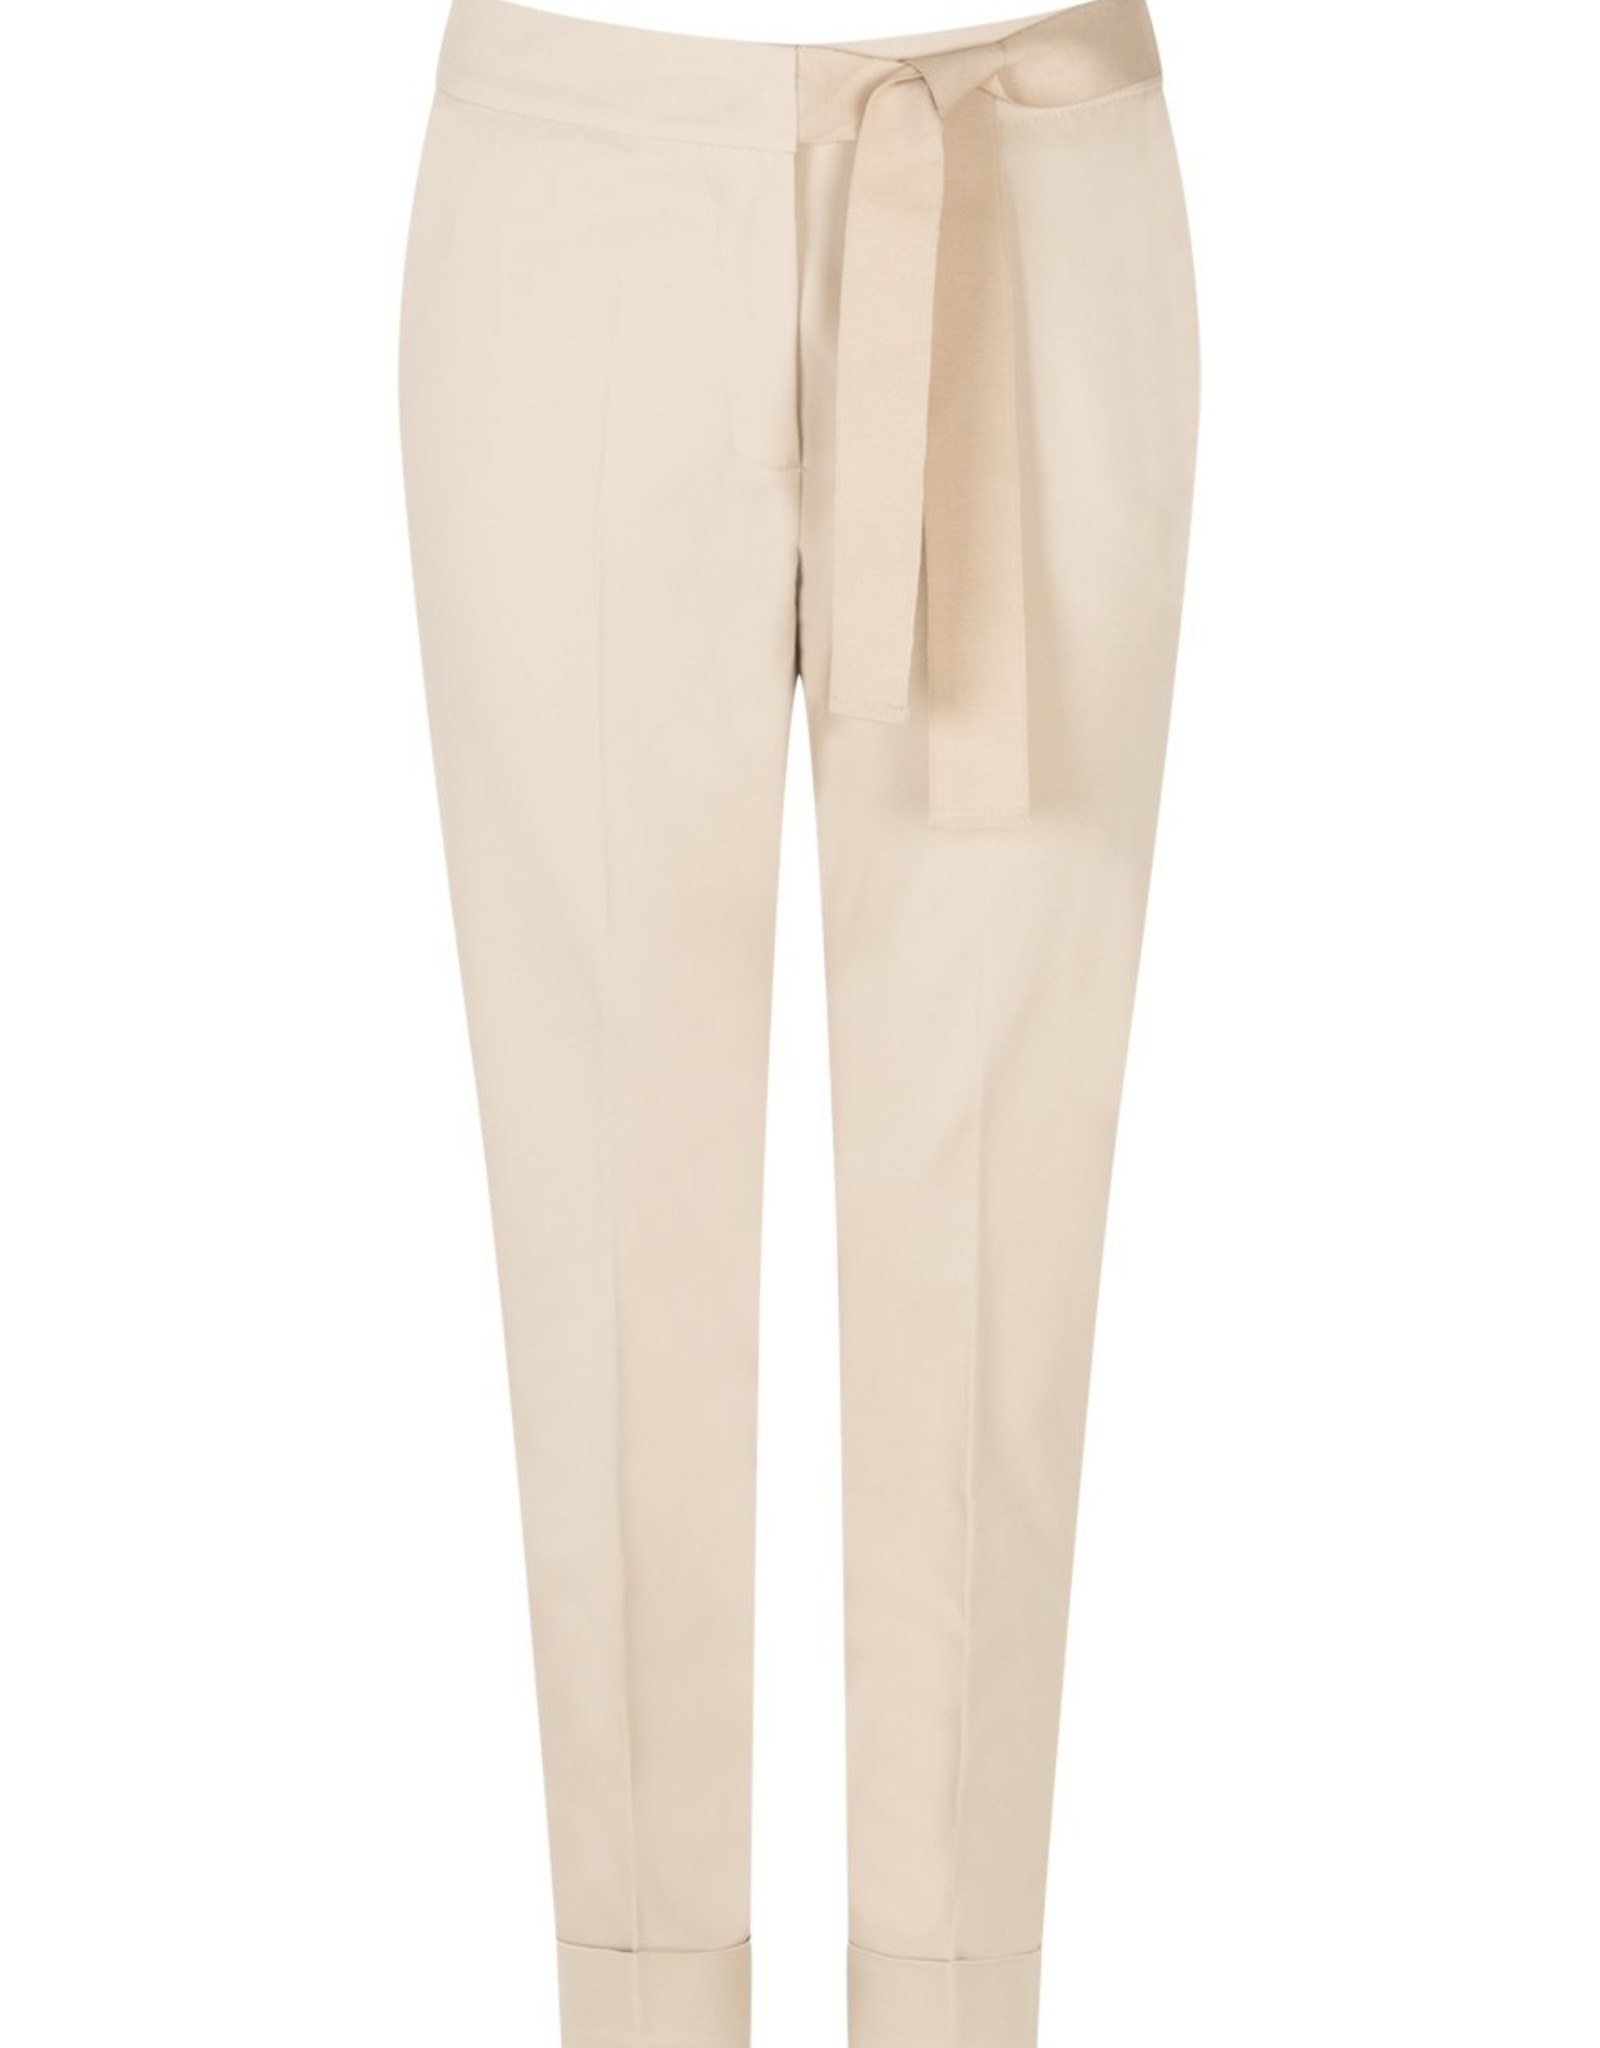 LaSalle Pantalon Met Strik Sand